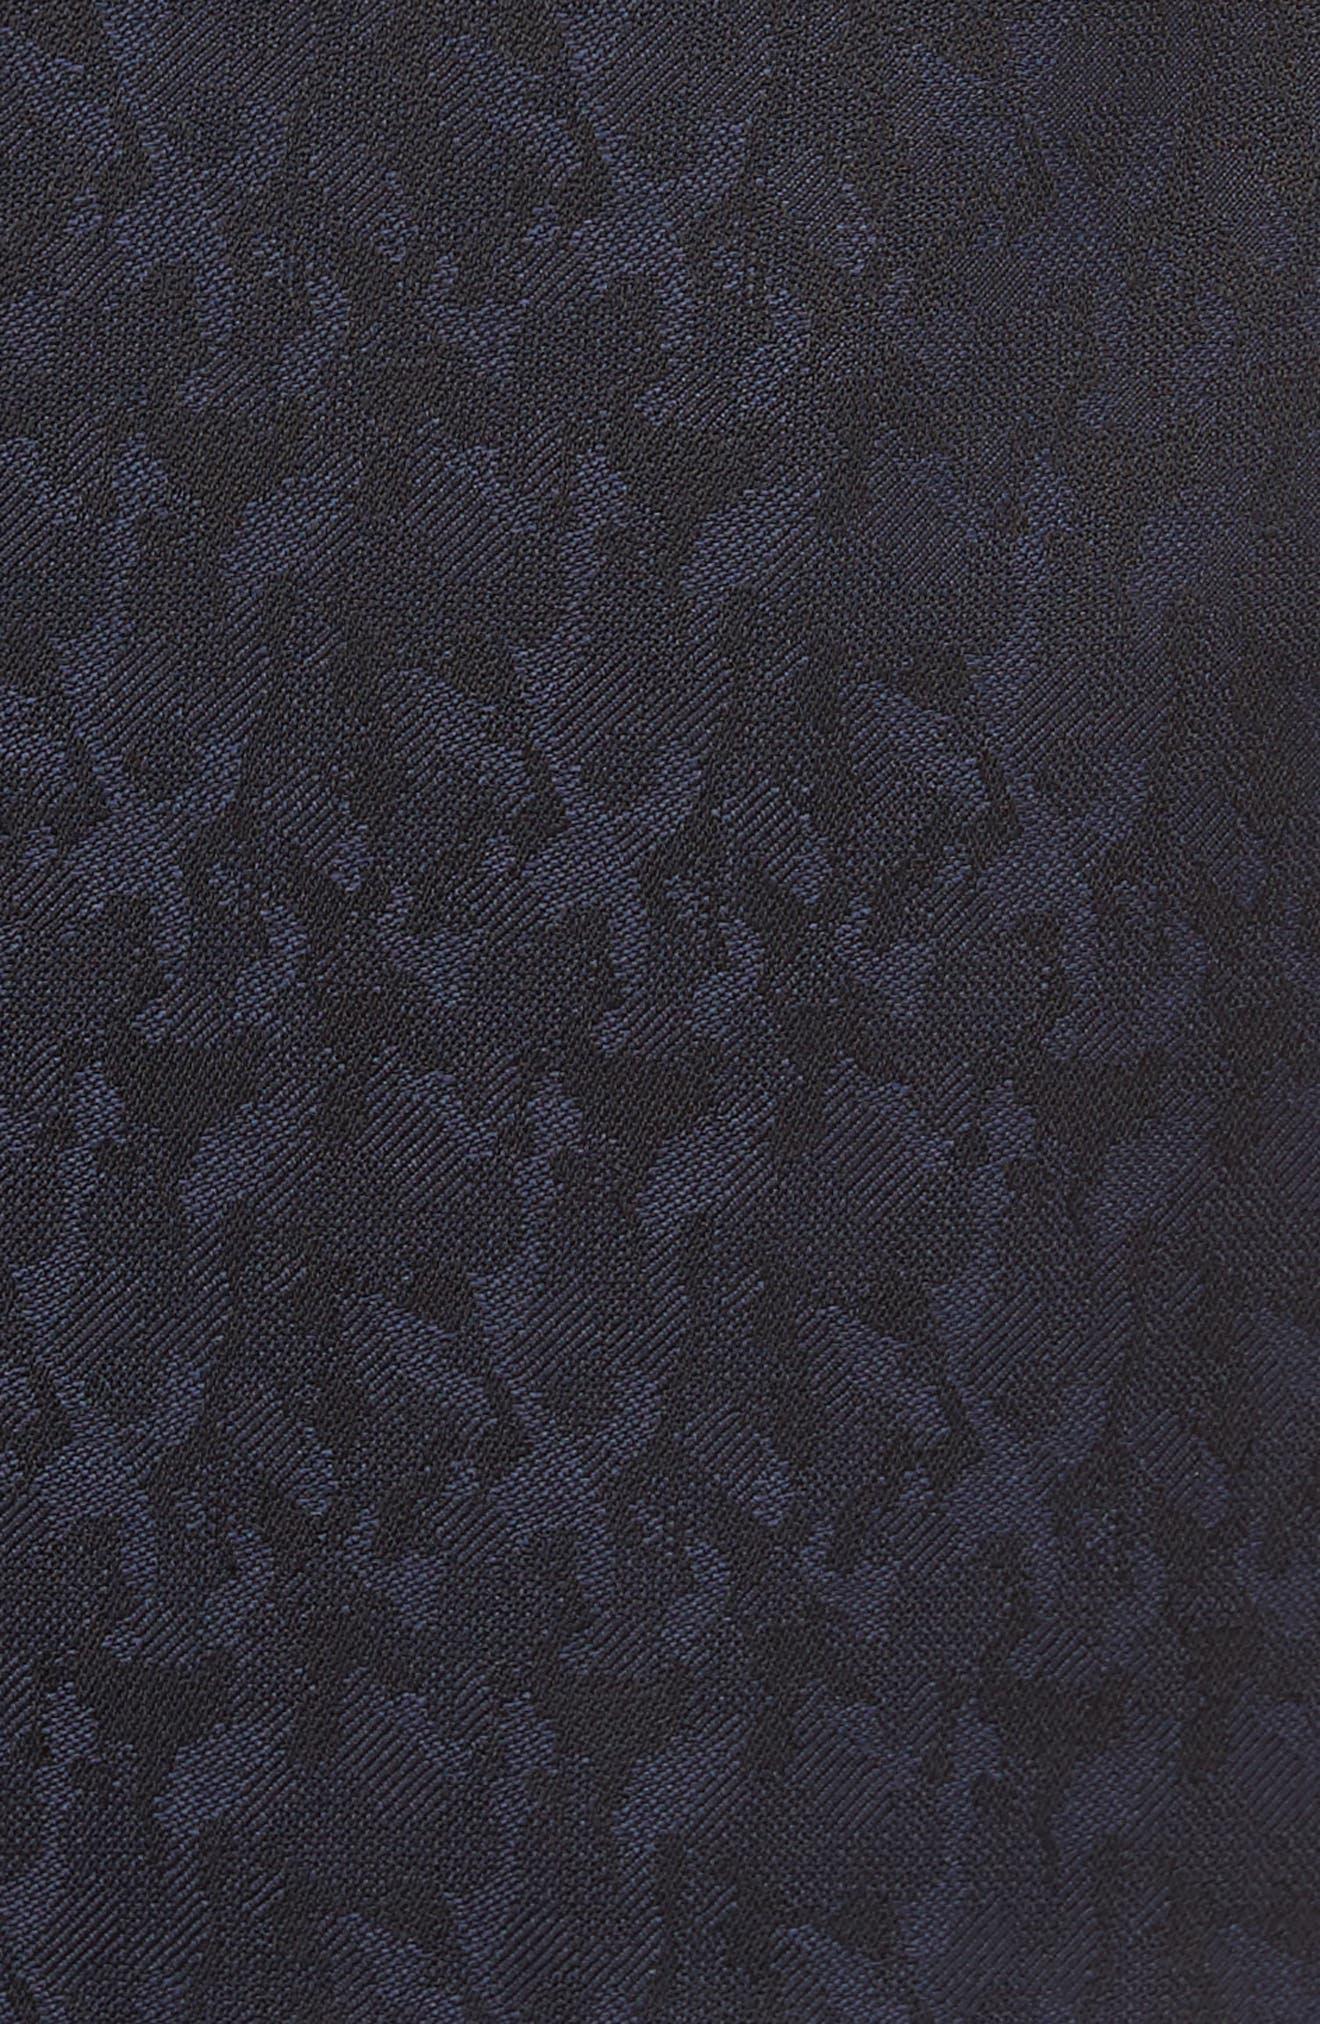 Josh Trim Fit Wool Dinner Jacket,                             Alternate thumbnail 6, color,                             410